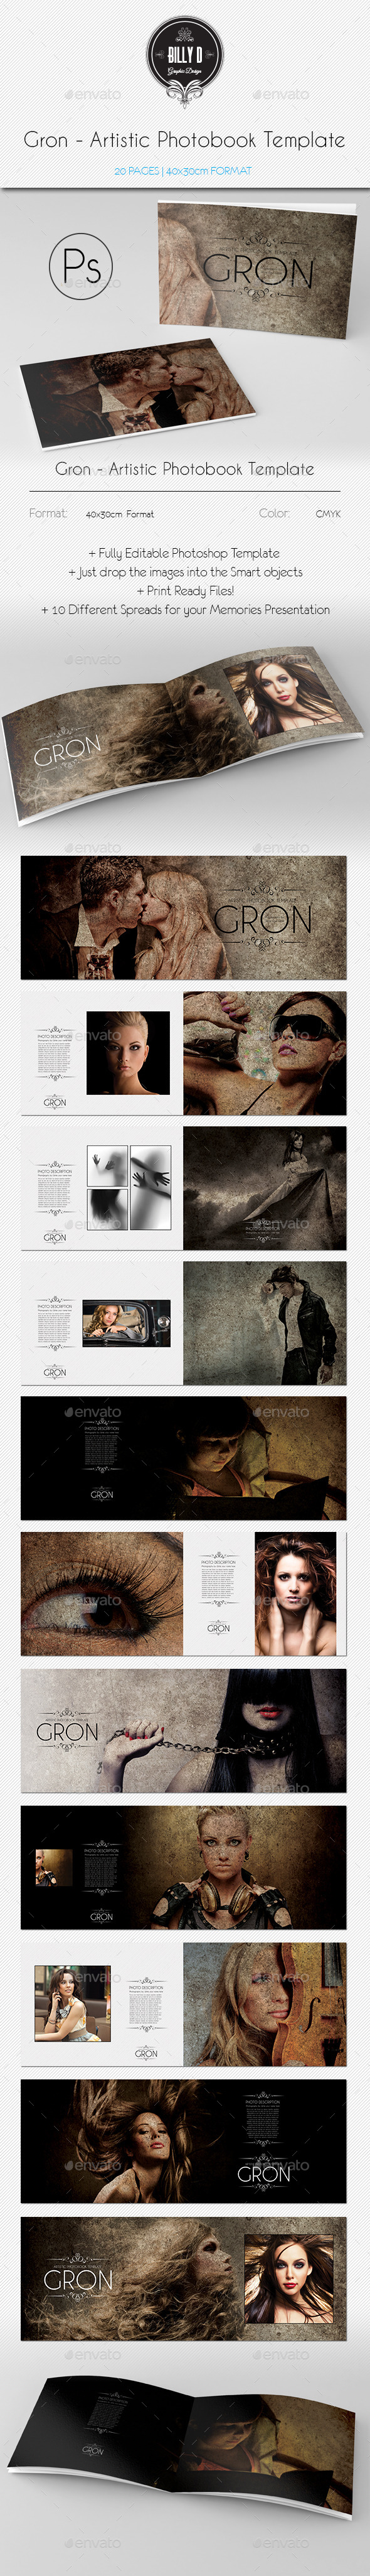 GraphicRiver Gron Artistic Photobook Template 10054915